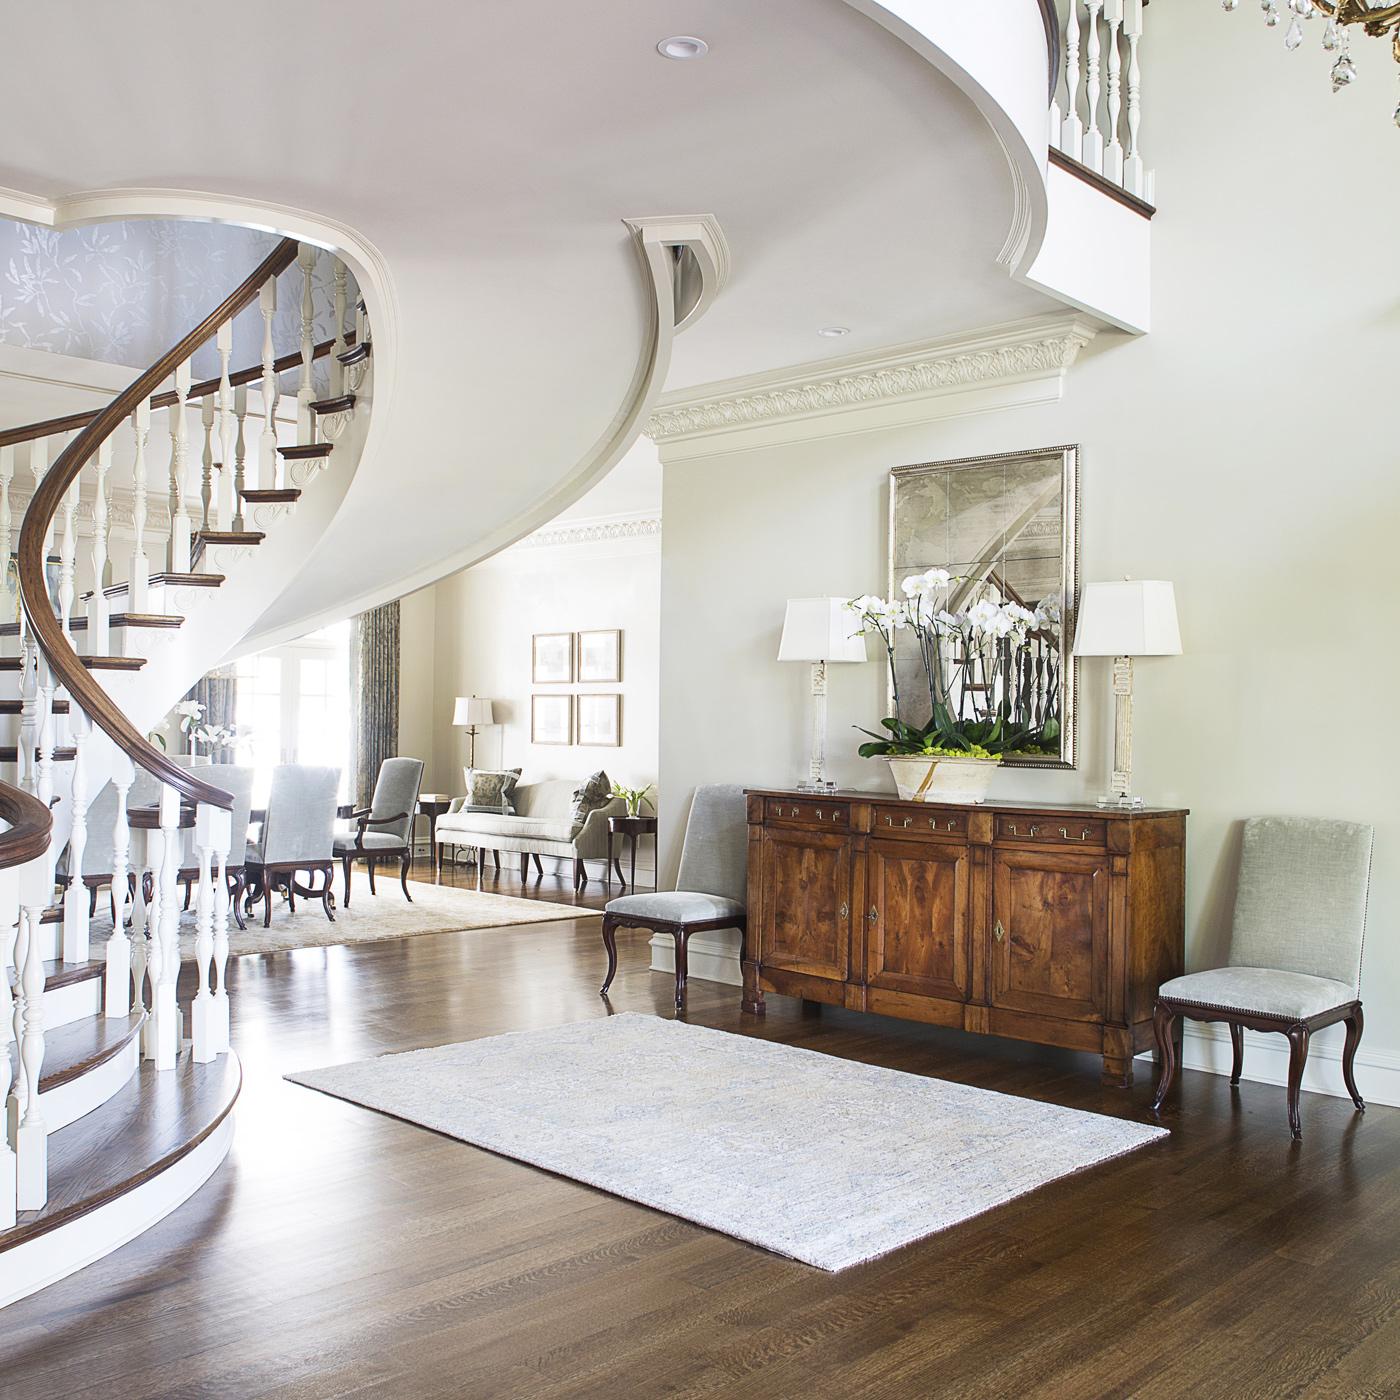 Cindy-McCord-Interior-Design-Collierville-House-013.jpg